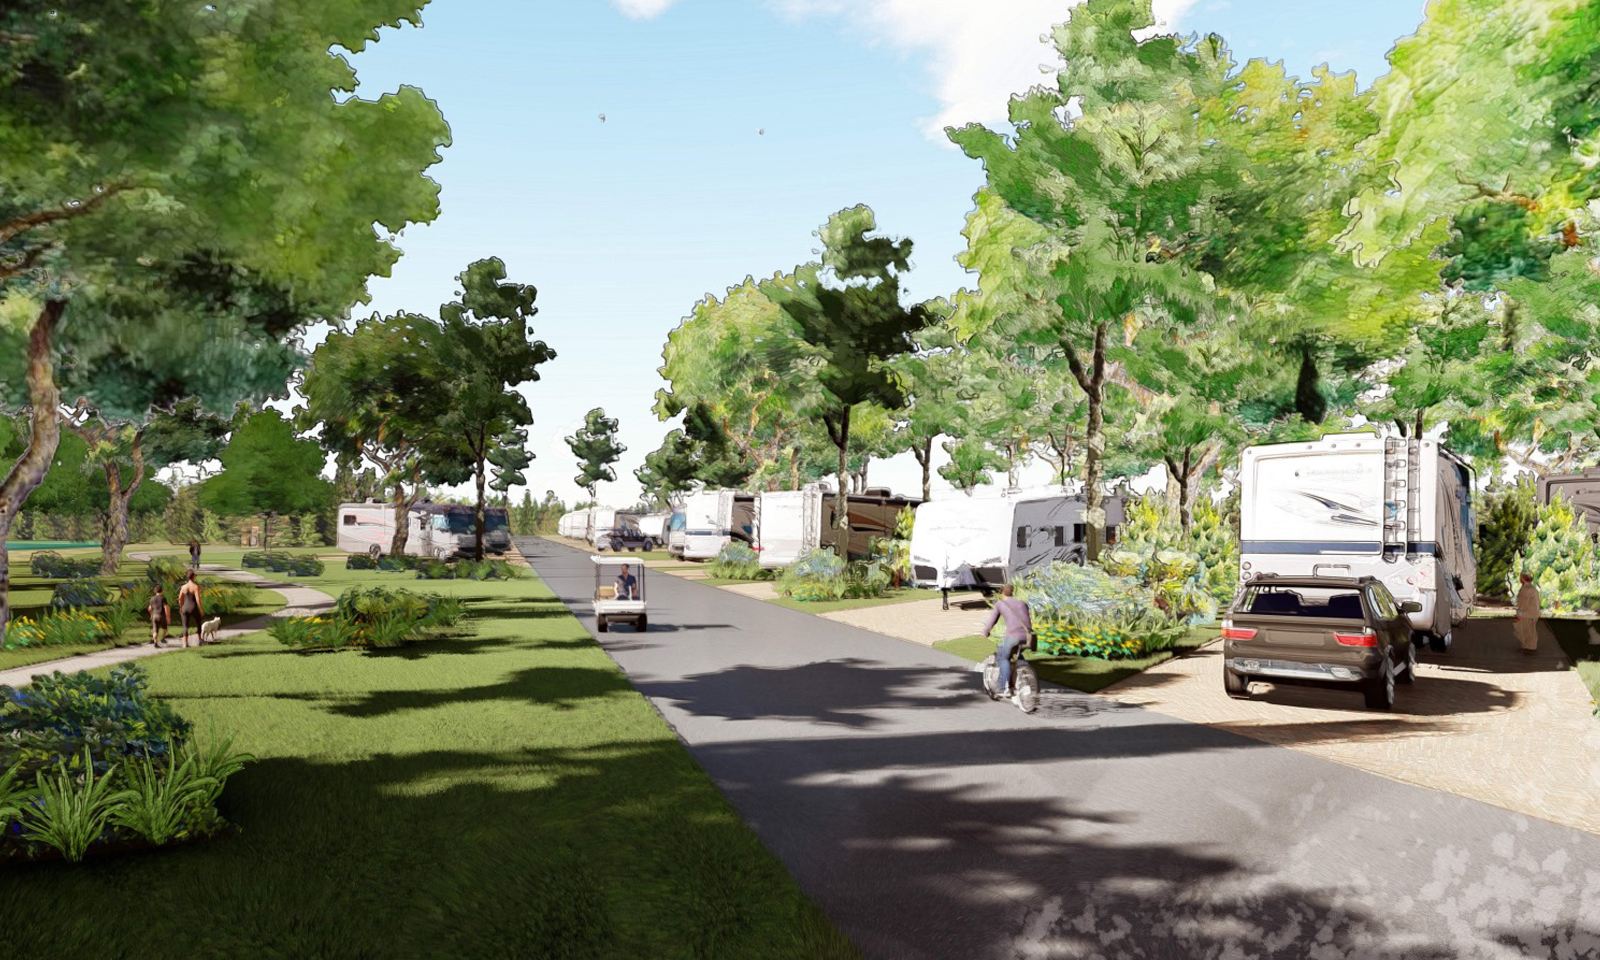 Hilton Head National RV Resort rendering